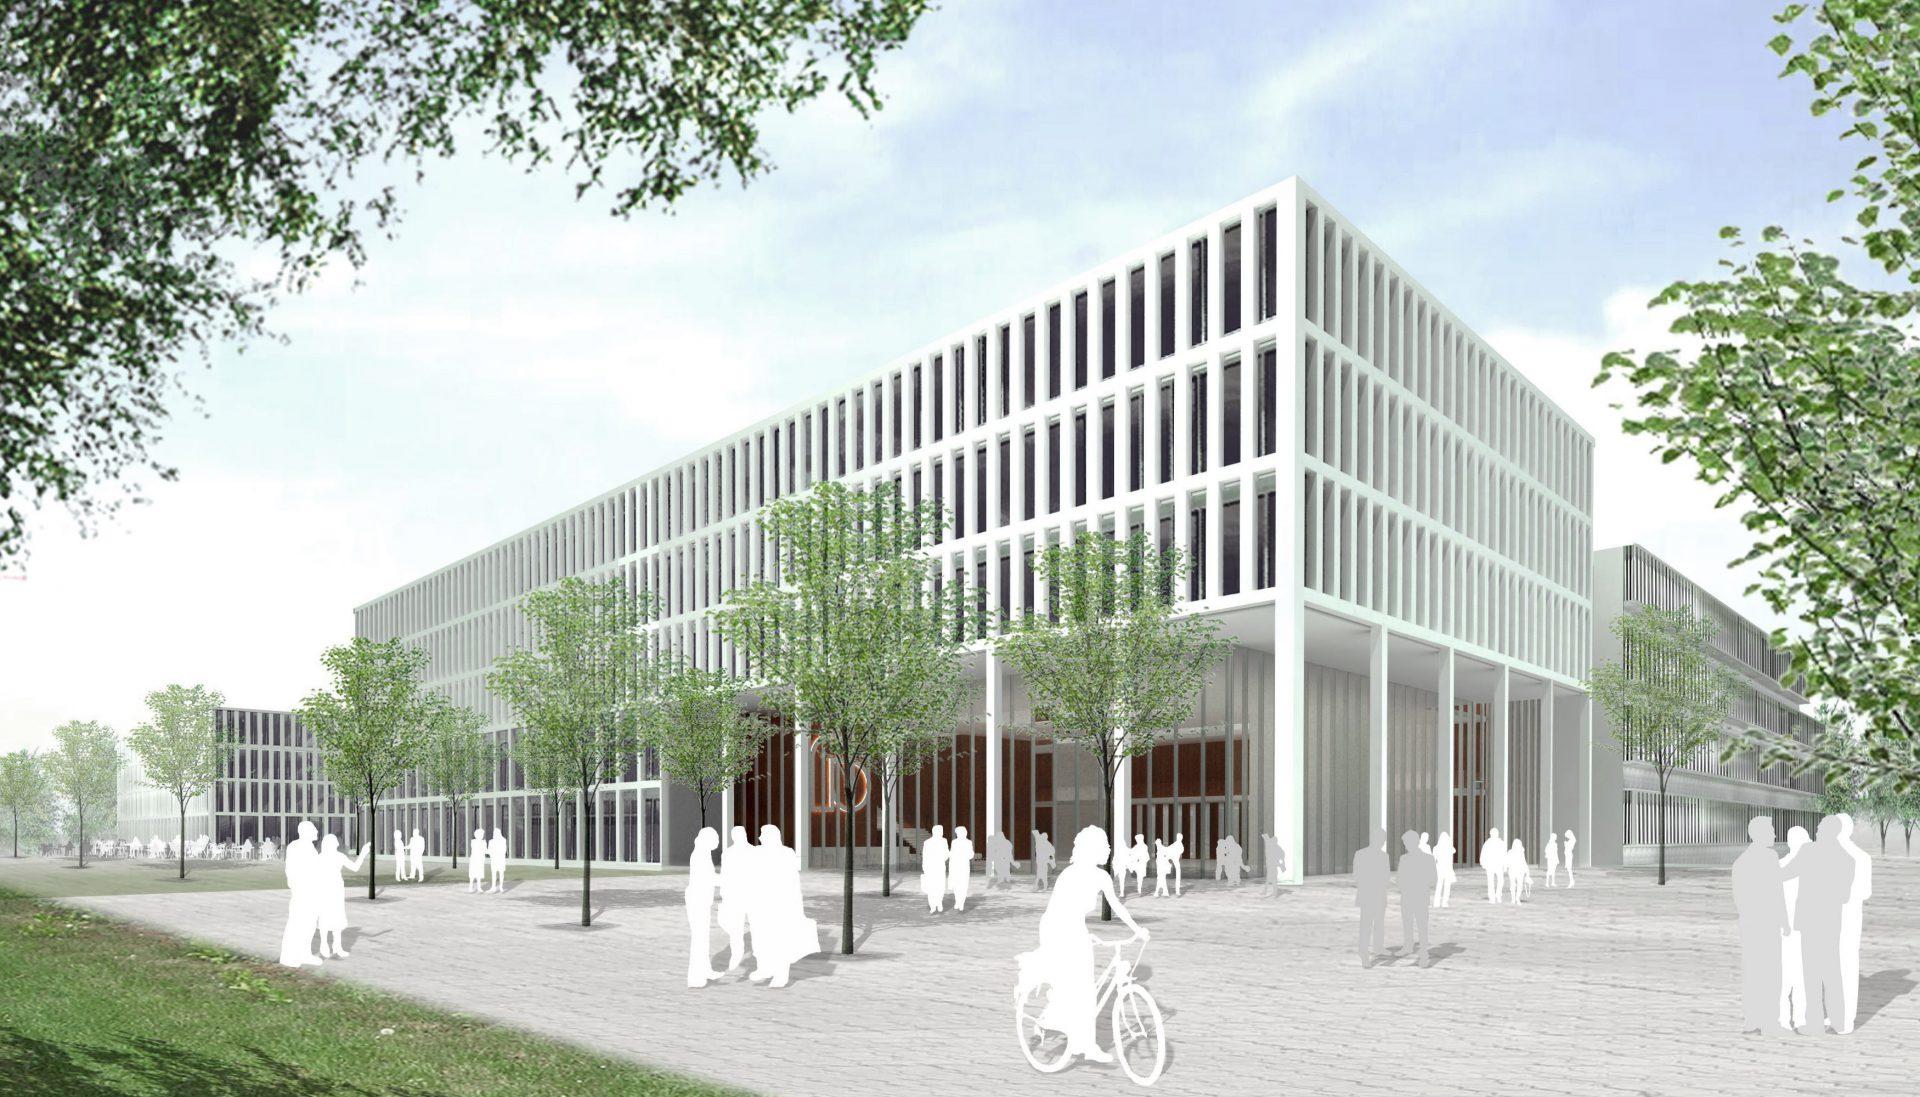 Campus Fachhochschule Bielefeld